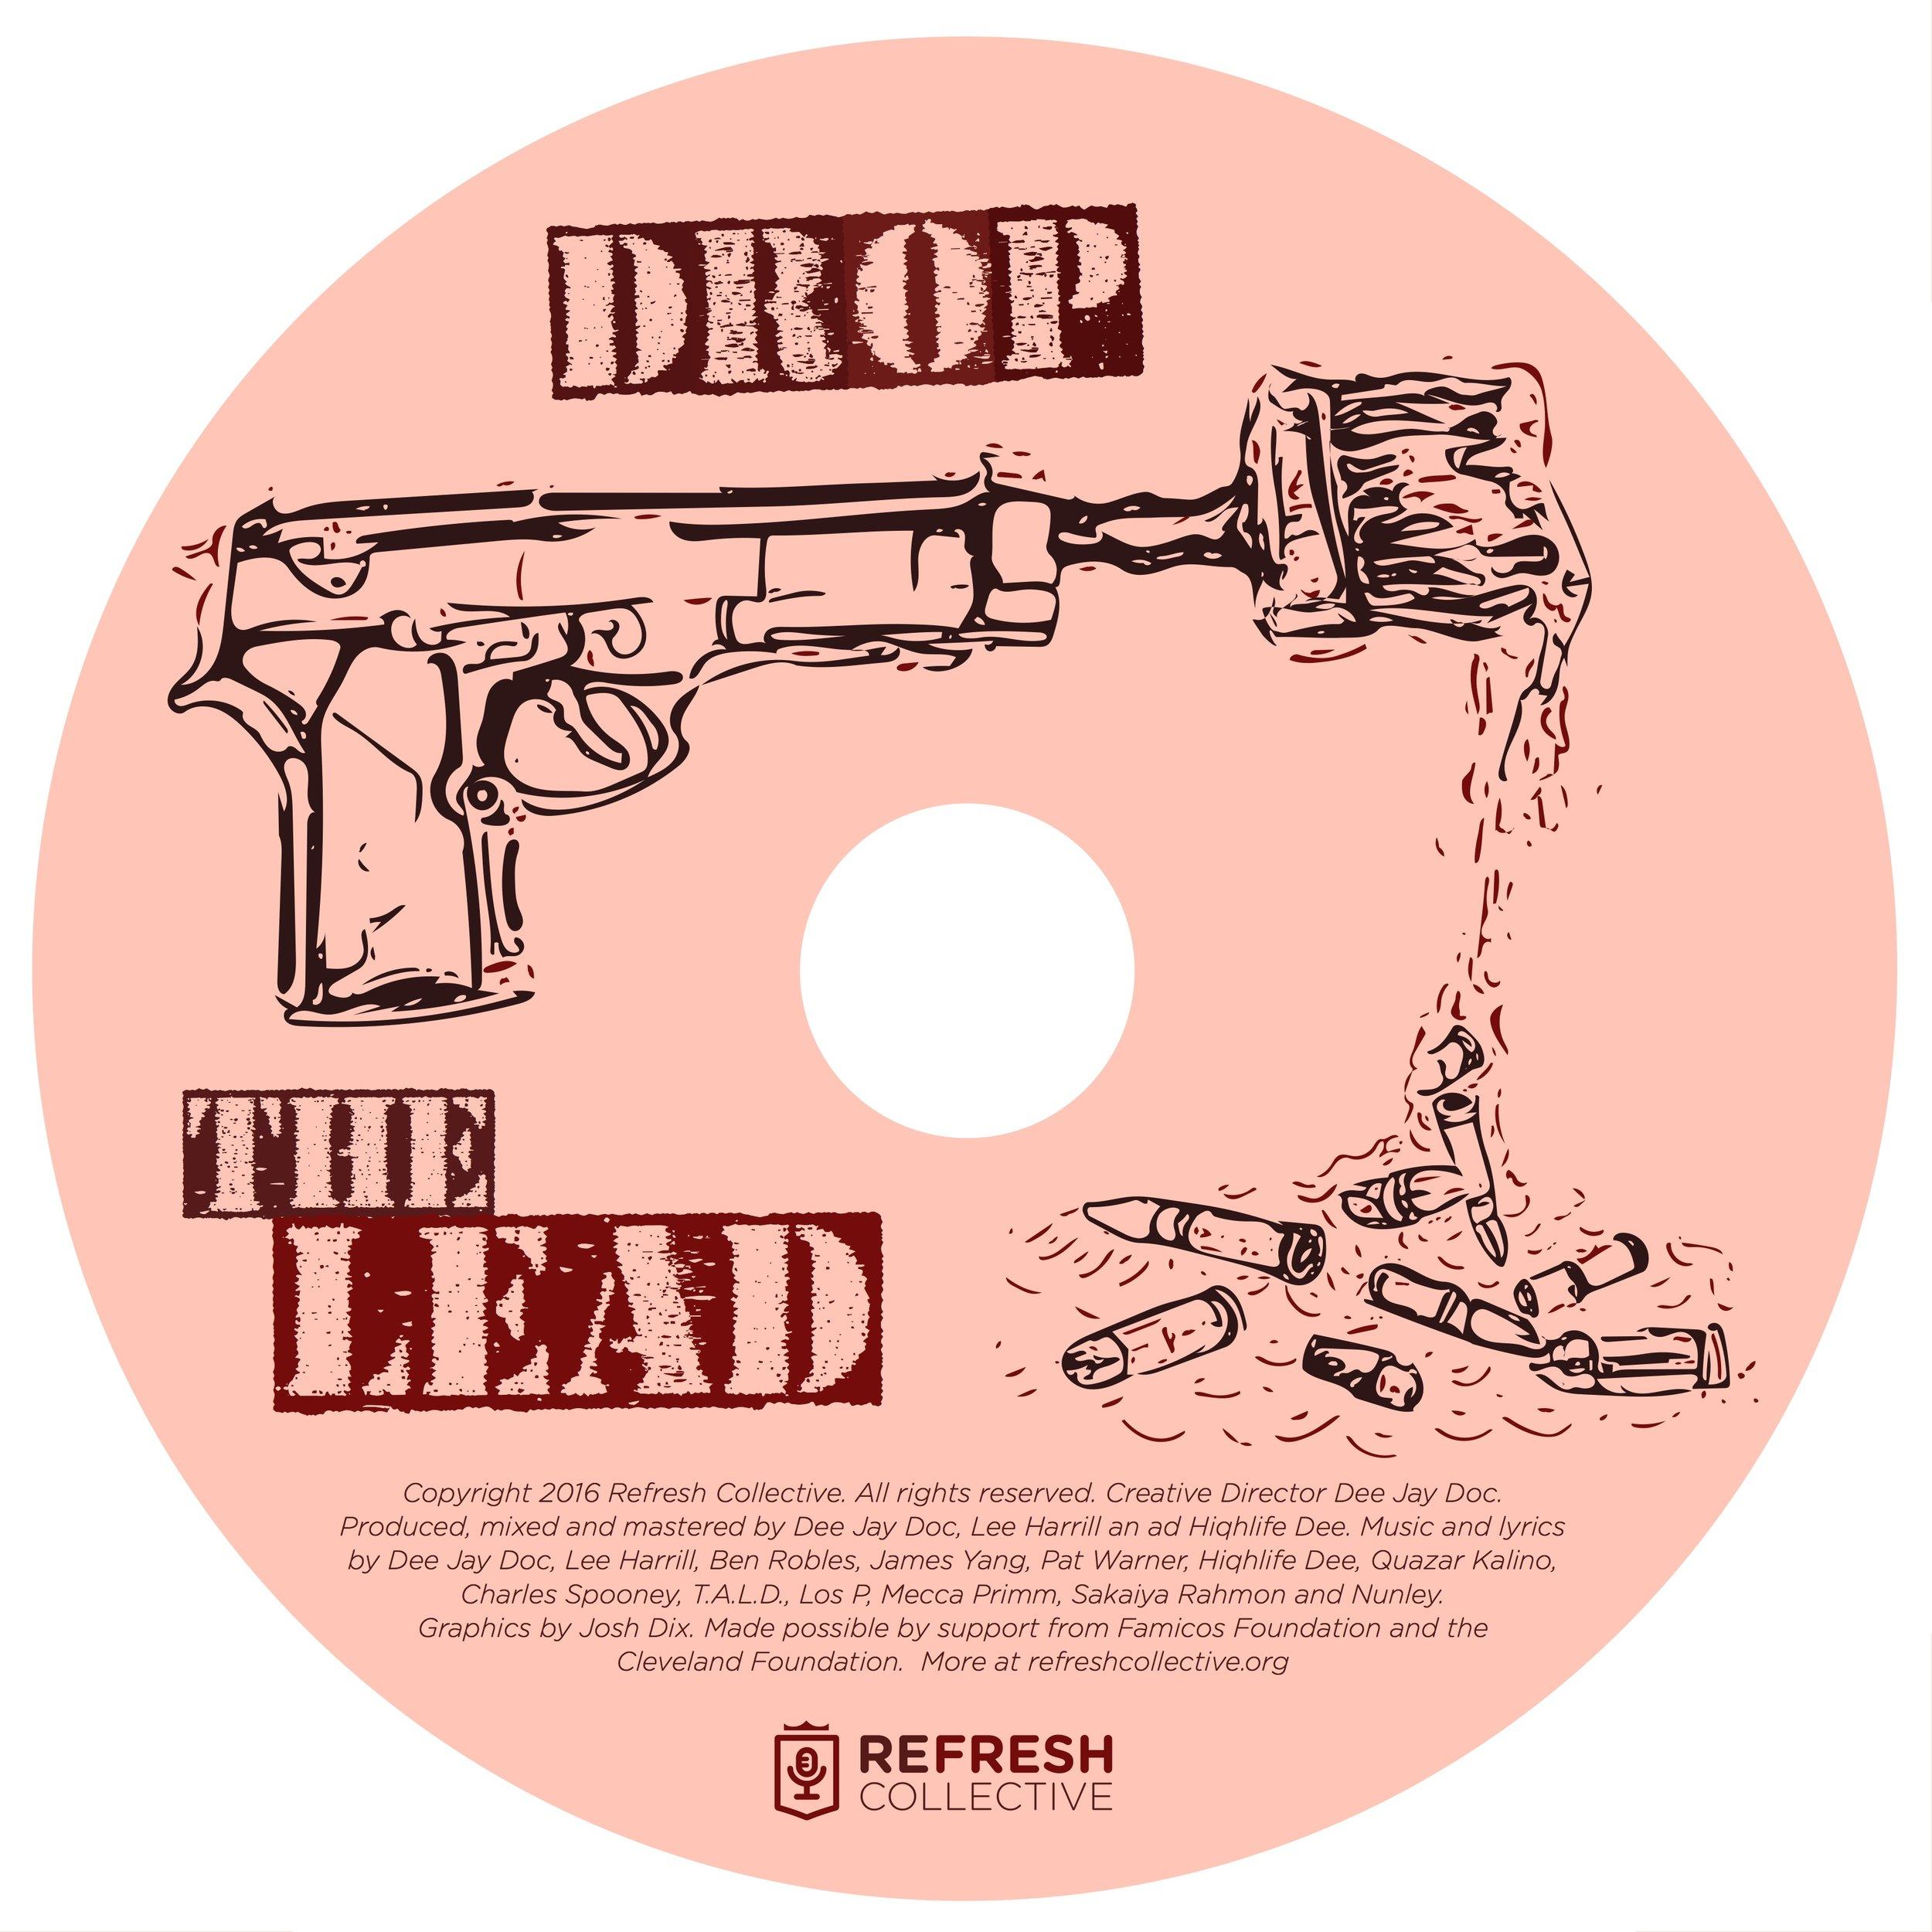 Drop the Lead Cd image3.jpg